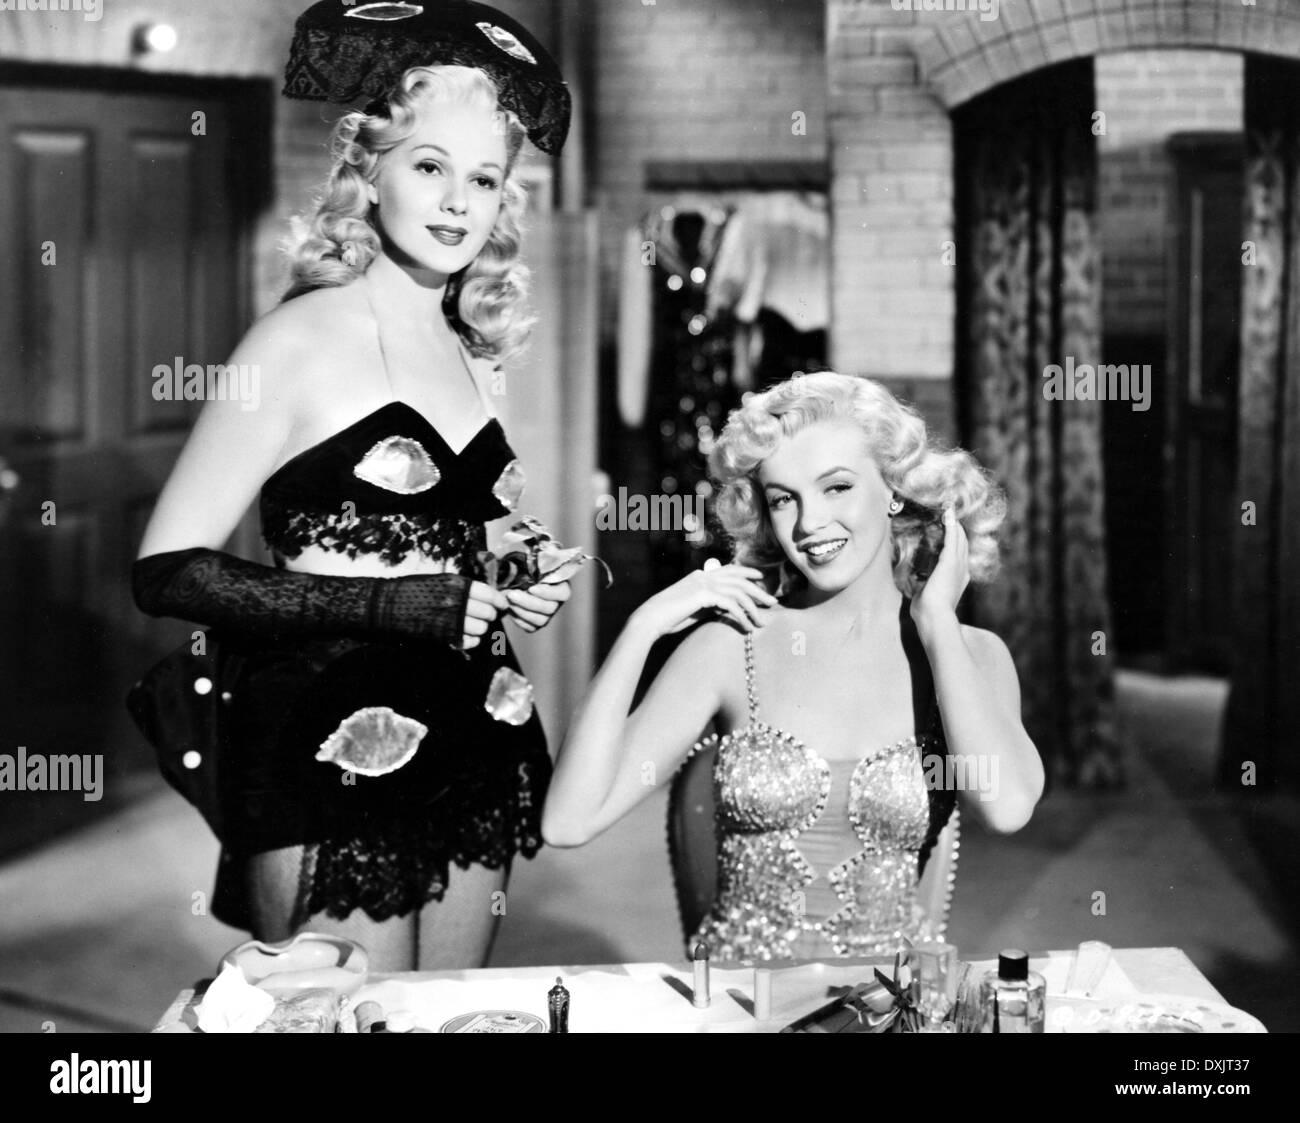 LADIES OF THE CHORUS (US1948) ADELE JERGENS, MARILYN MONROE - Stock Image